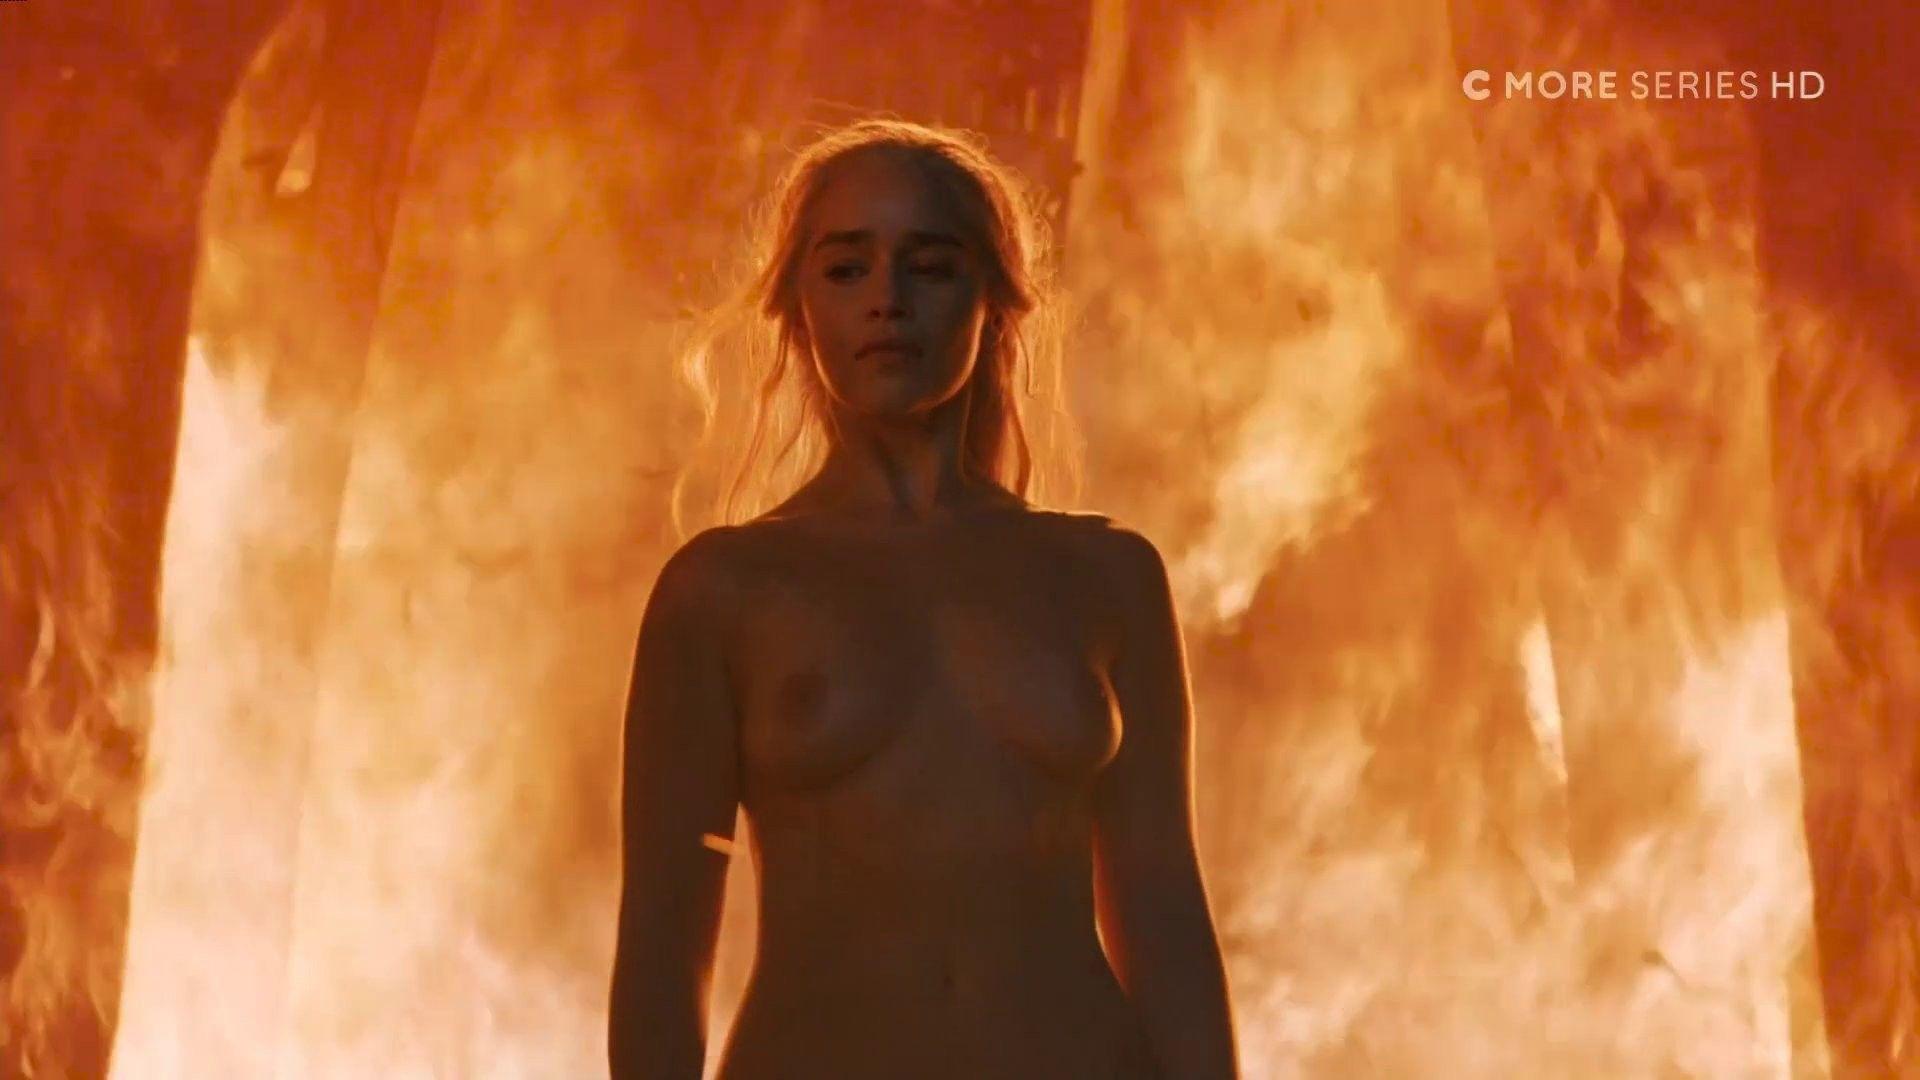 Emilia clarke nude scene game thrones series new picture